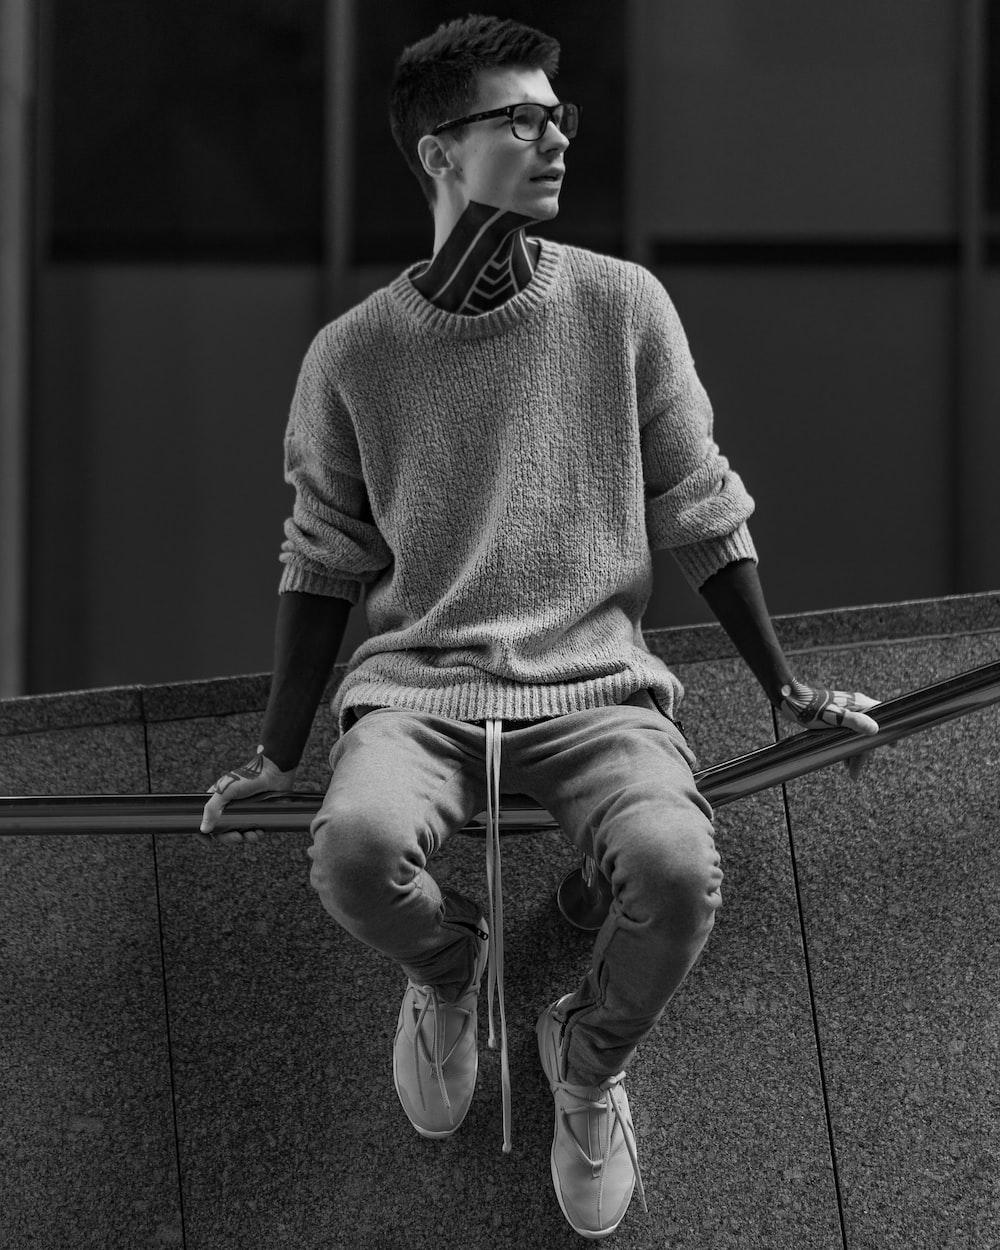 man in sweater sitting on railings